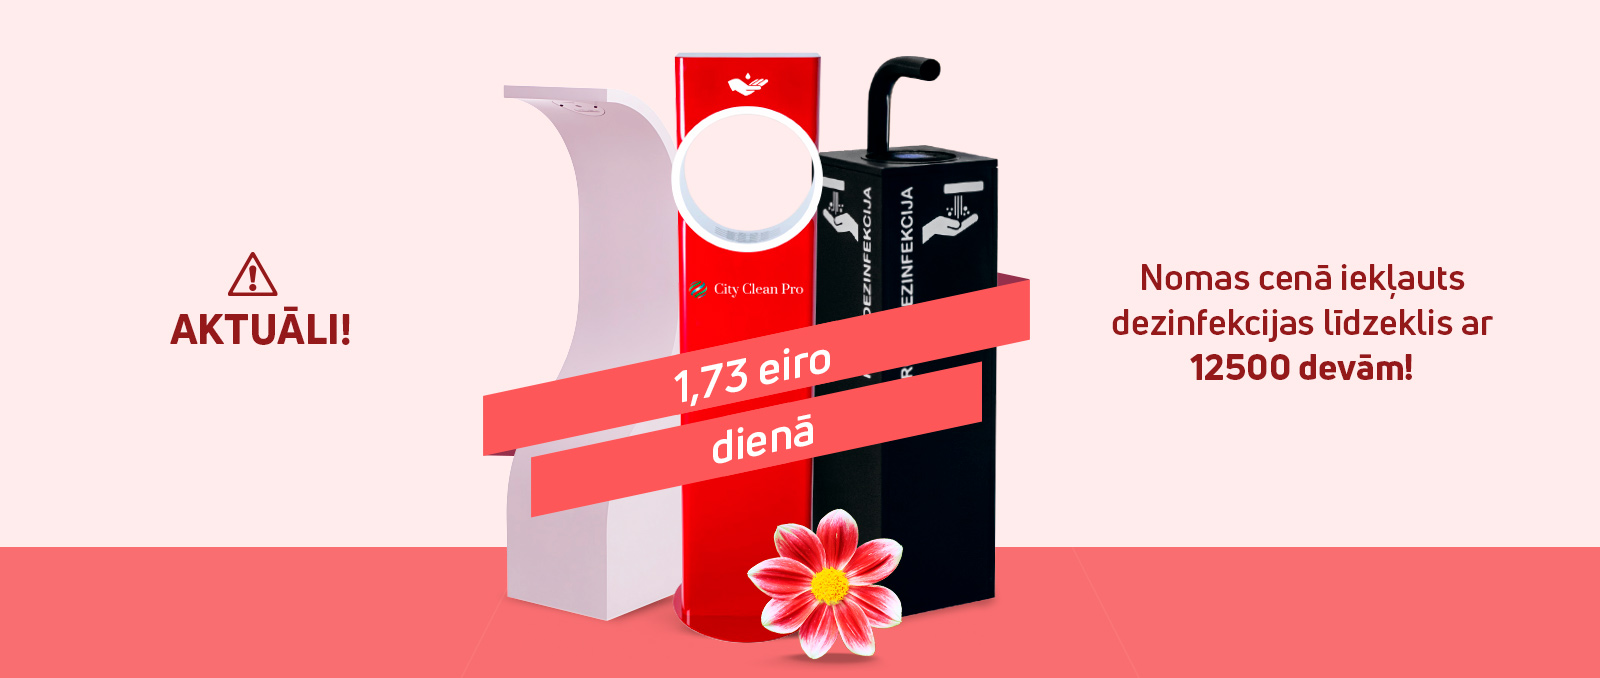 Bezkontakta roku stends / dozators / dispensers 2-lv